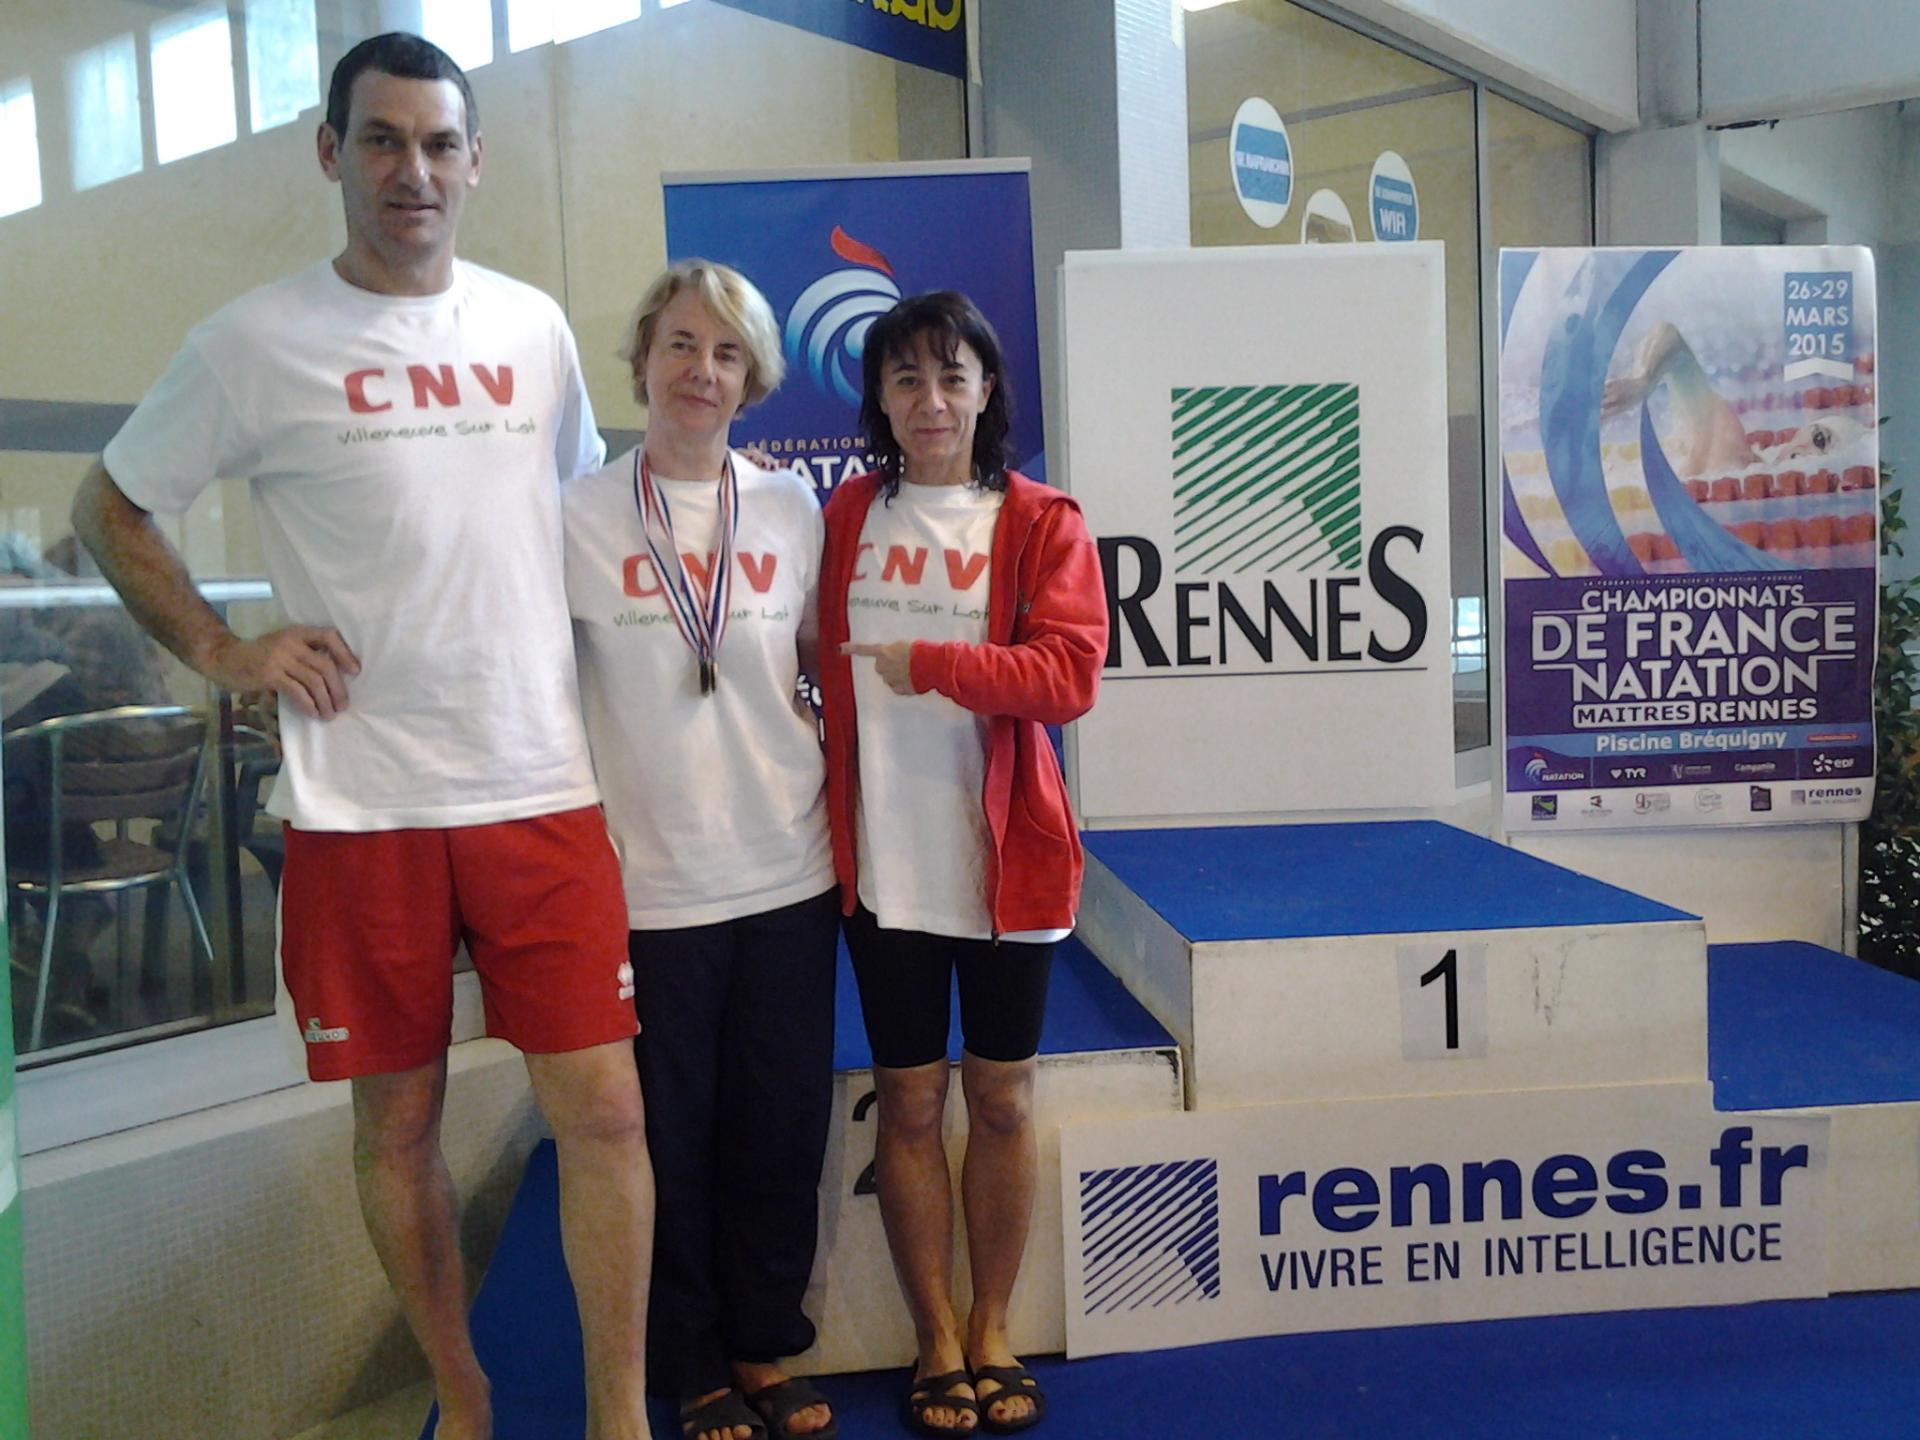 champ-master.rennes.2015